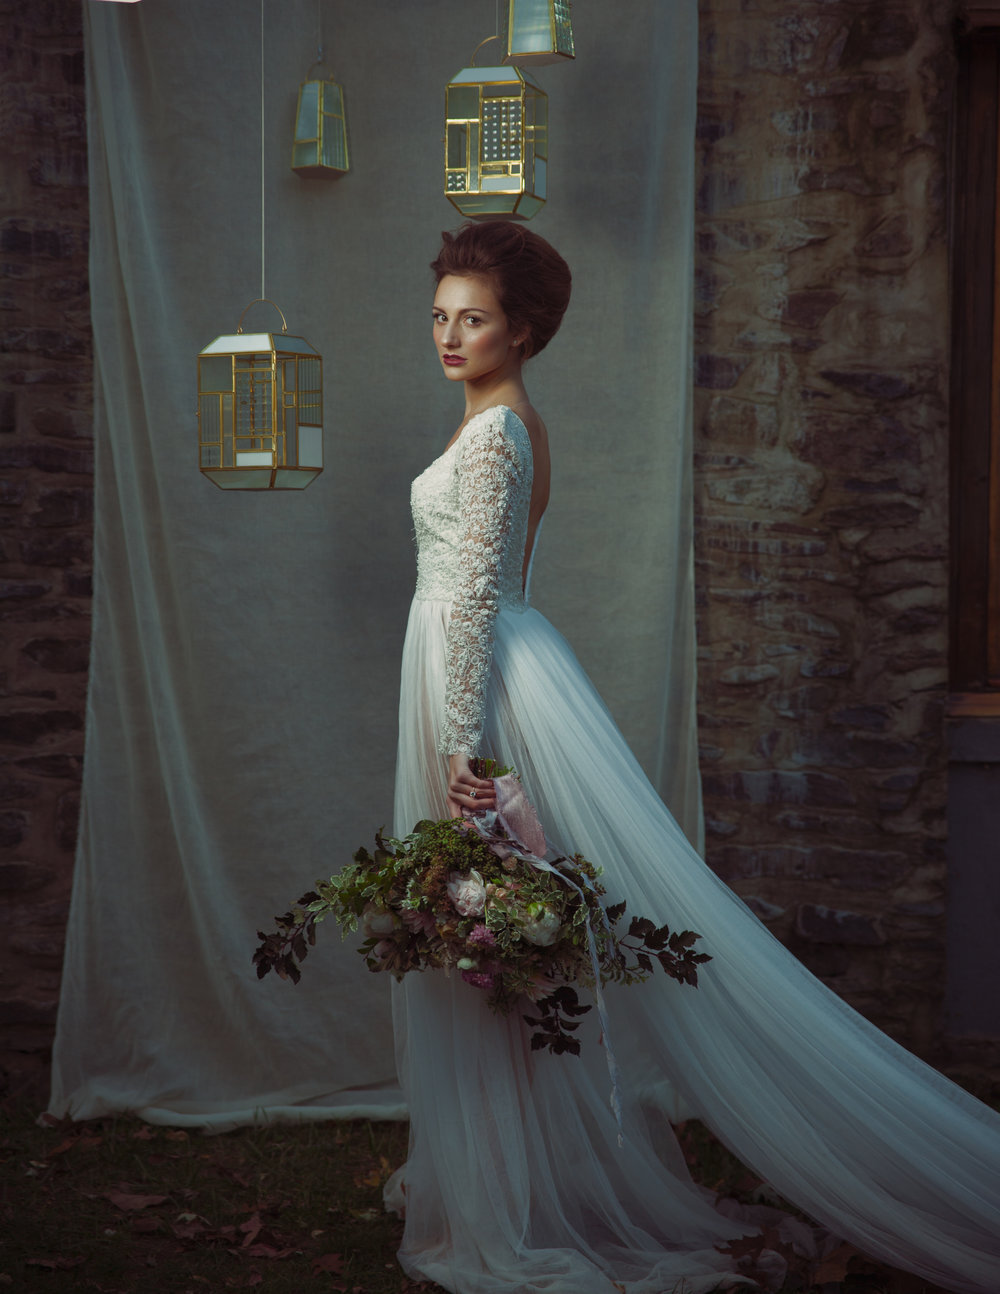 KateWoodmanPhotography-17.jpg